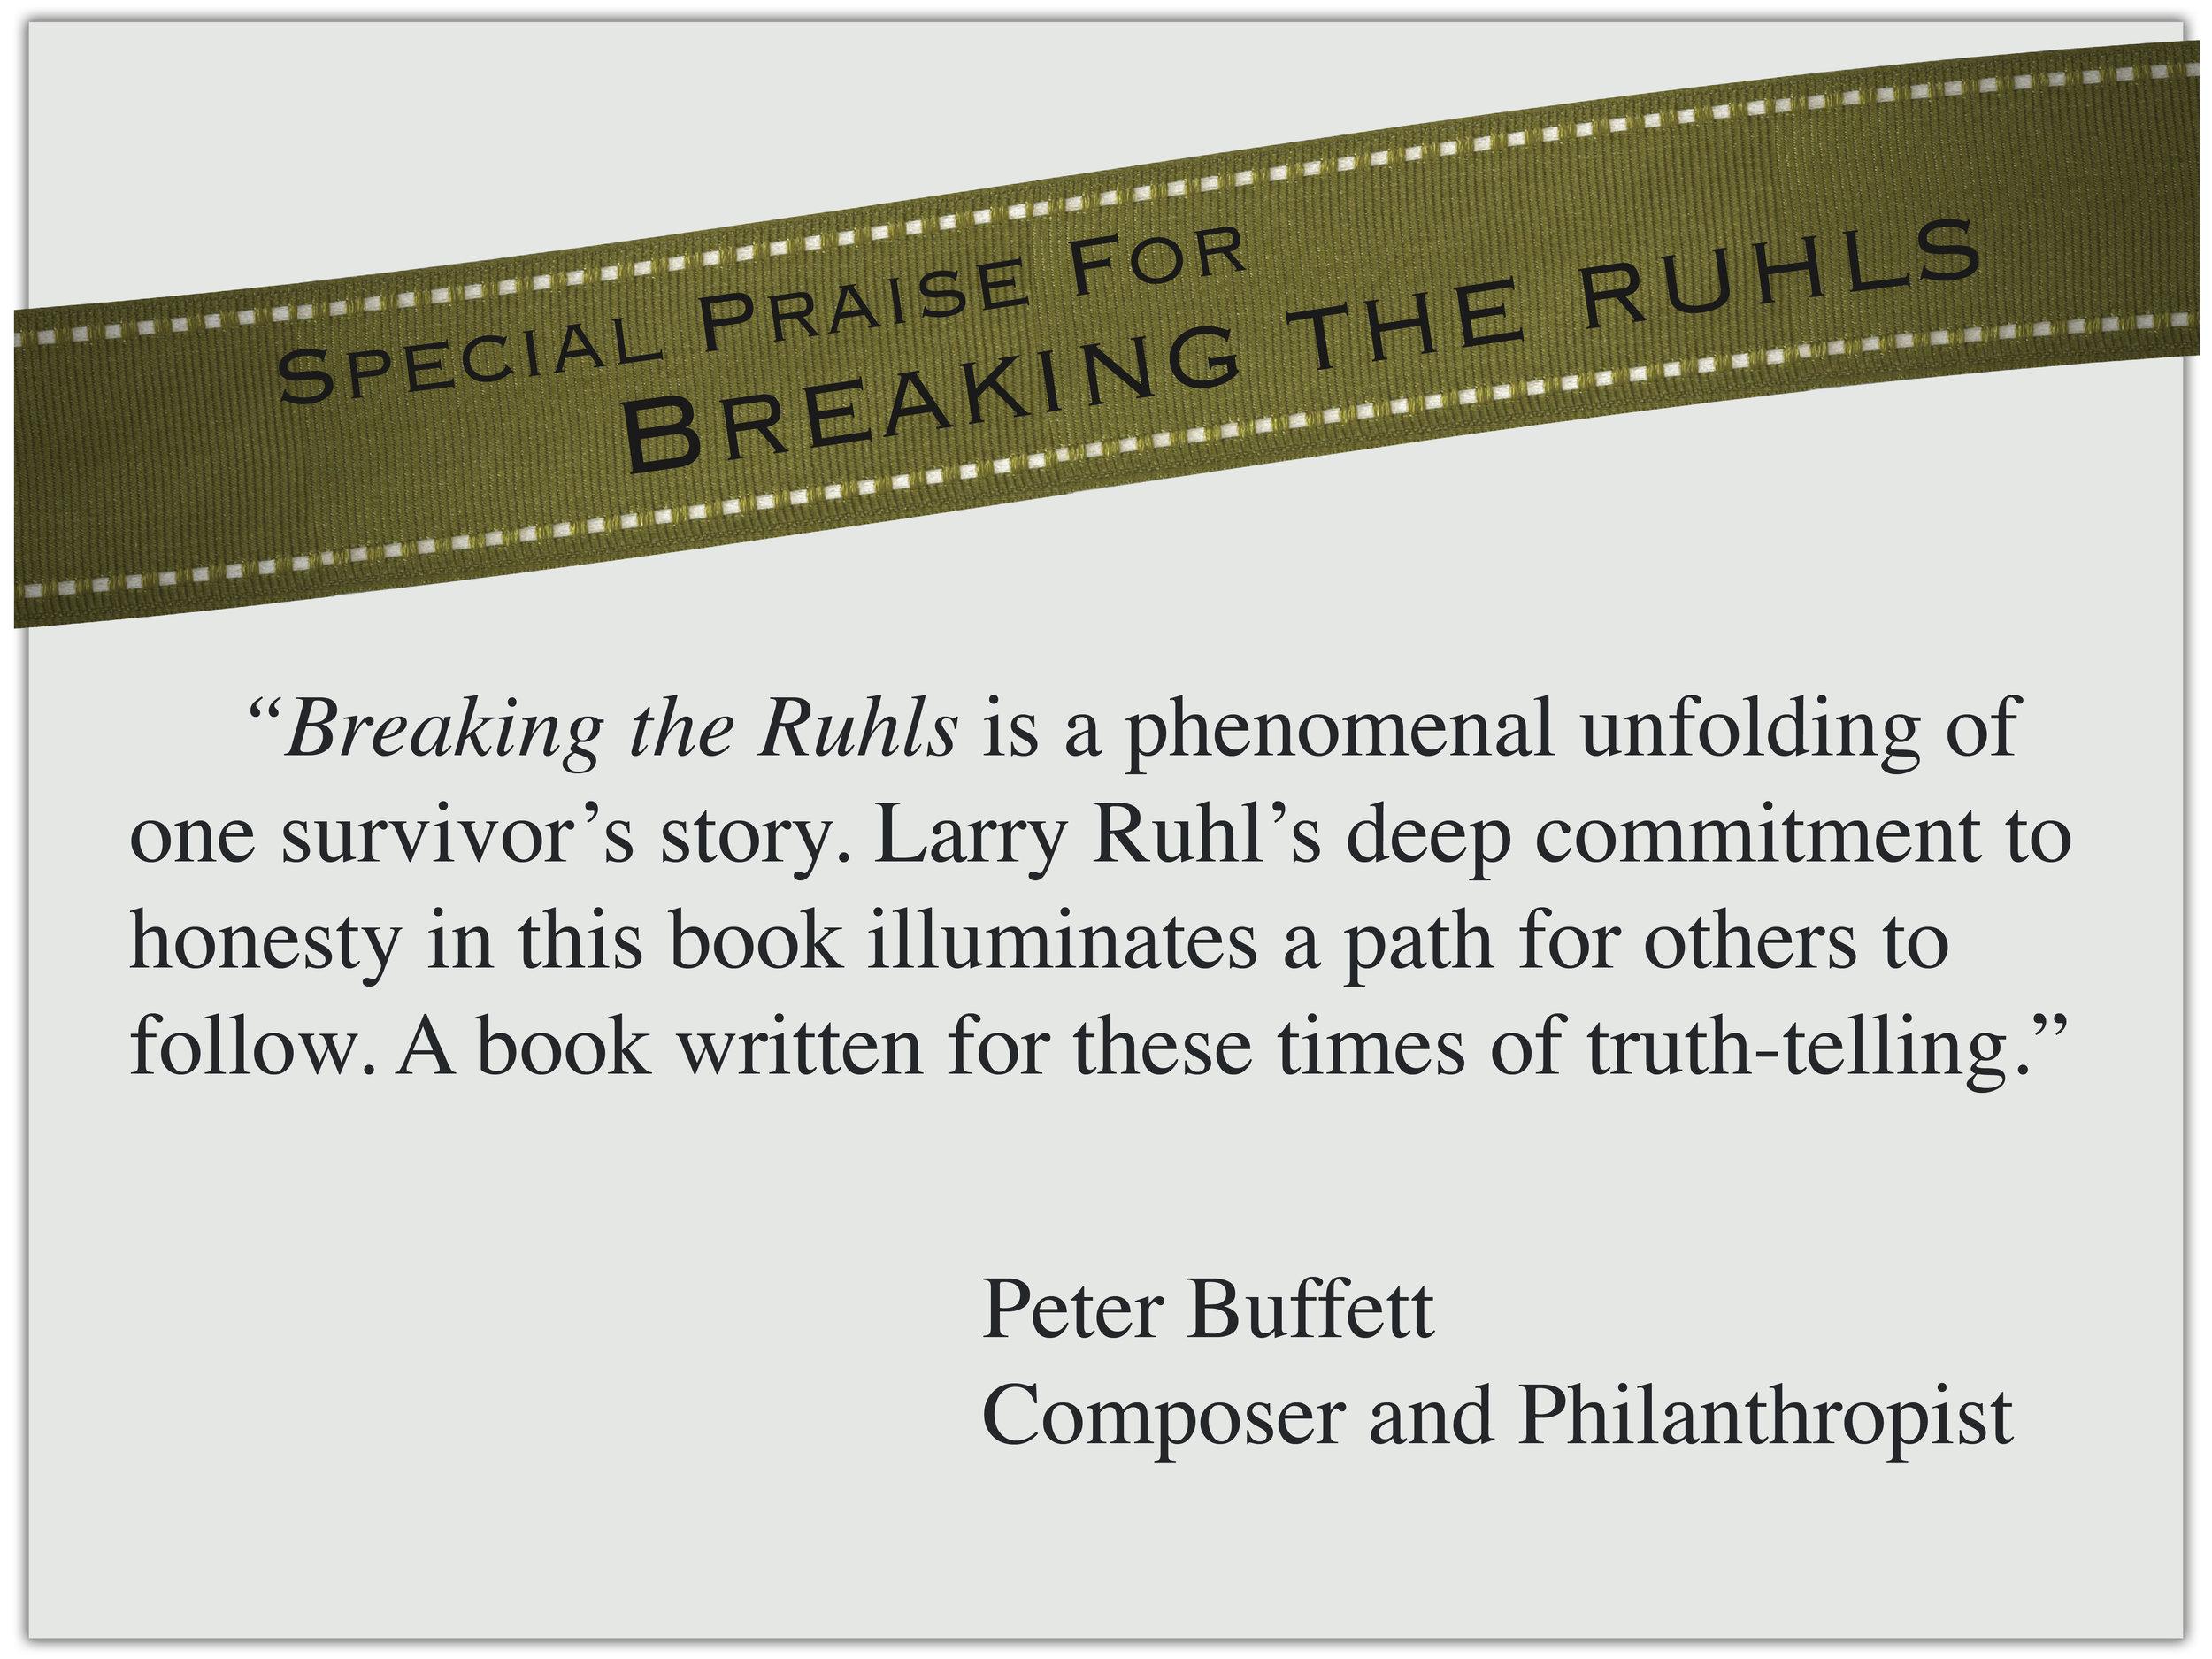 Blurb-1.jpg